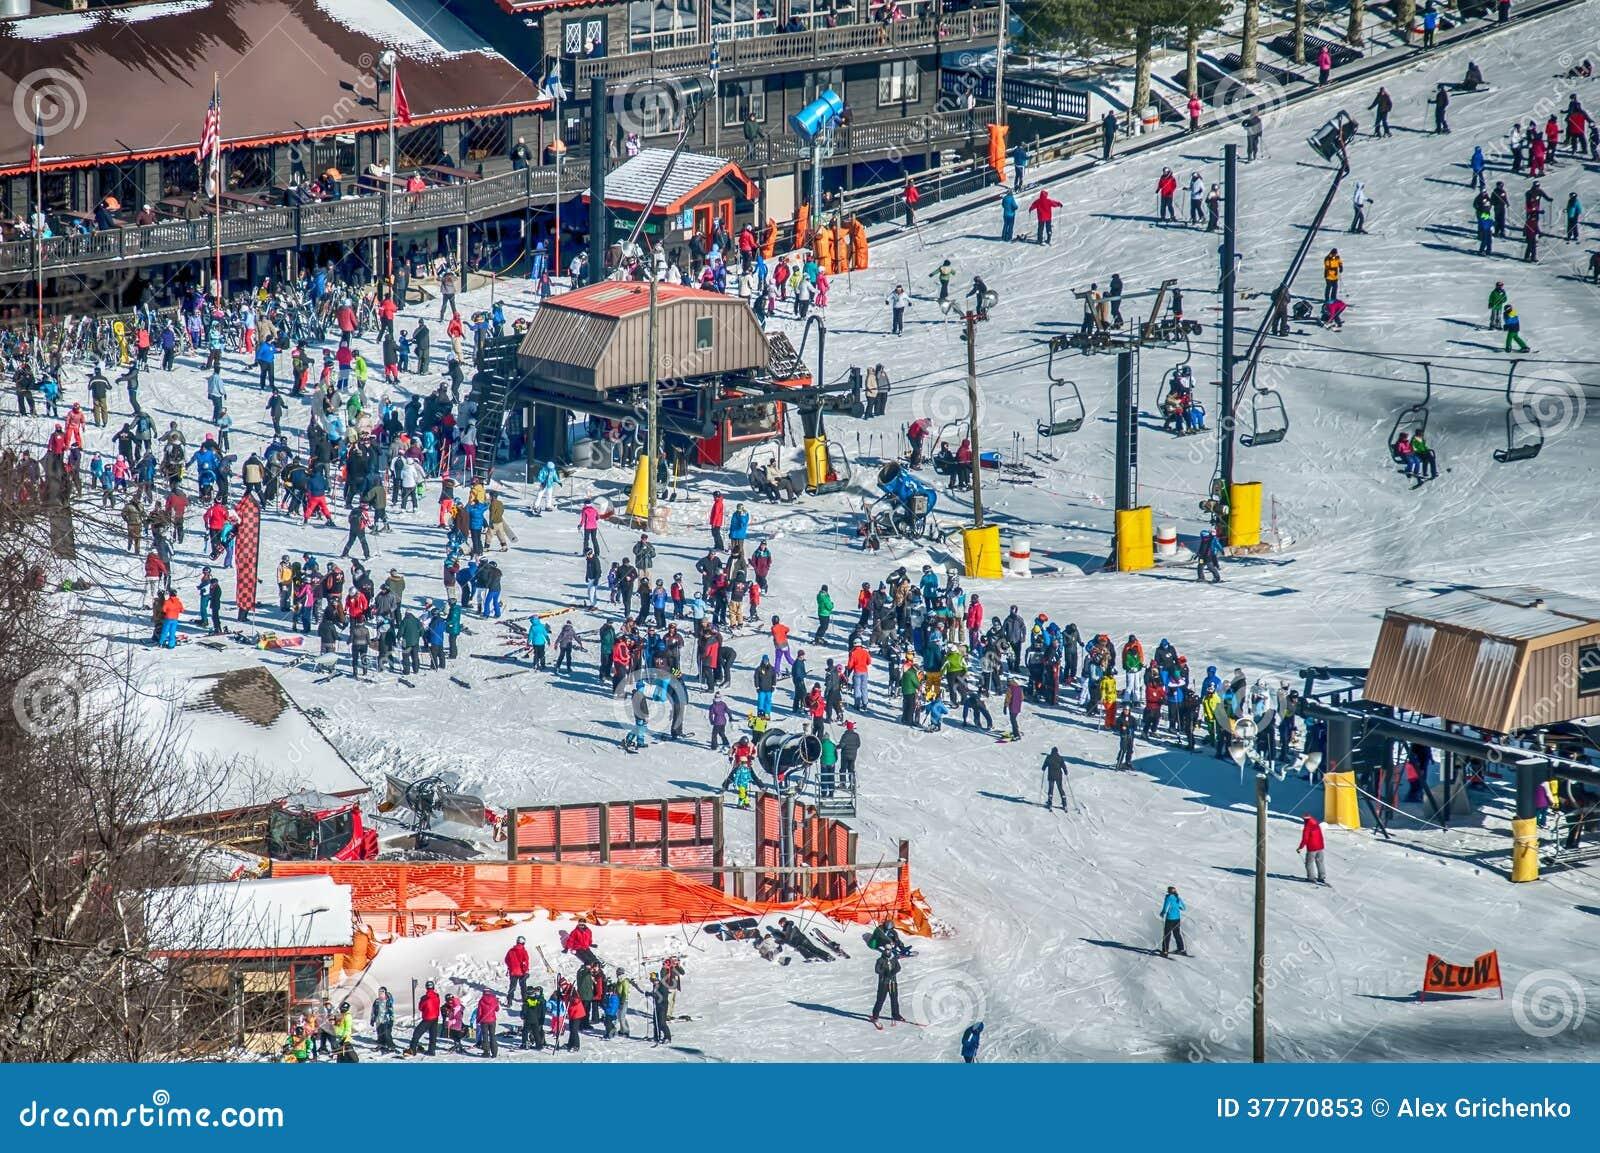 appalachian mountain ski resort stock image - image of hardwoods